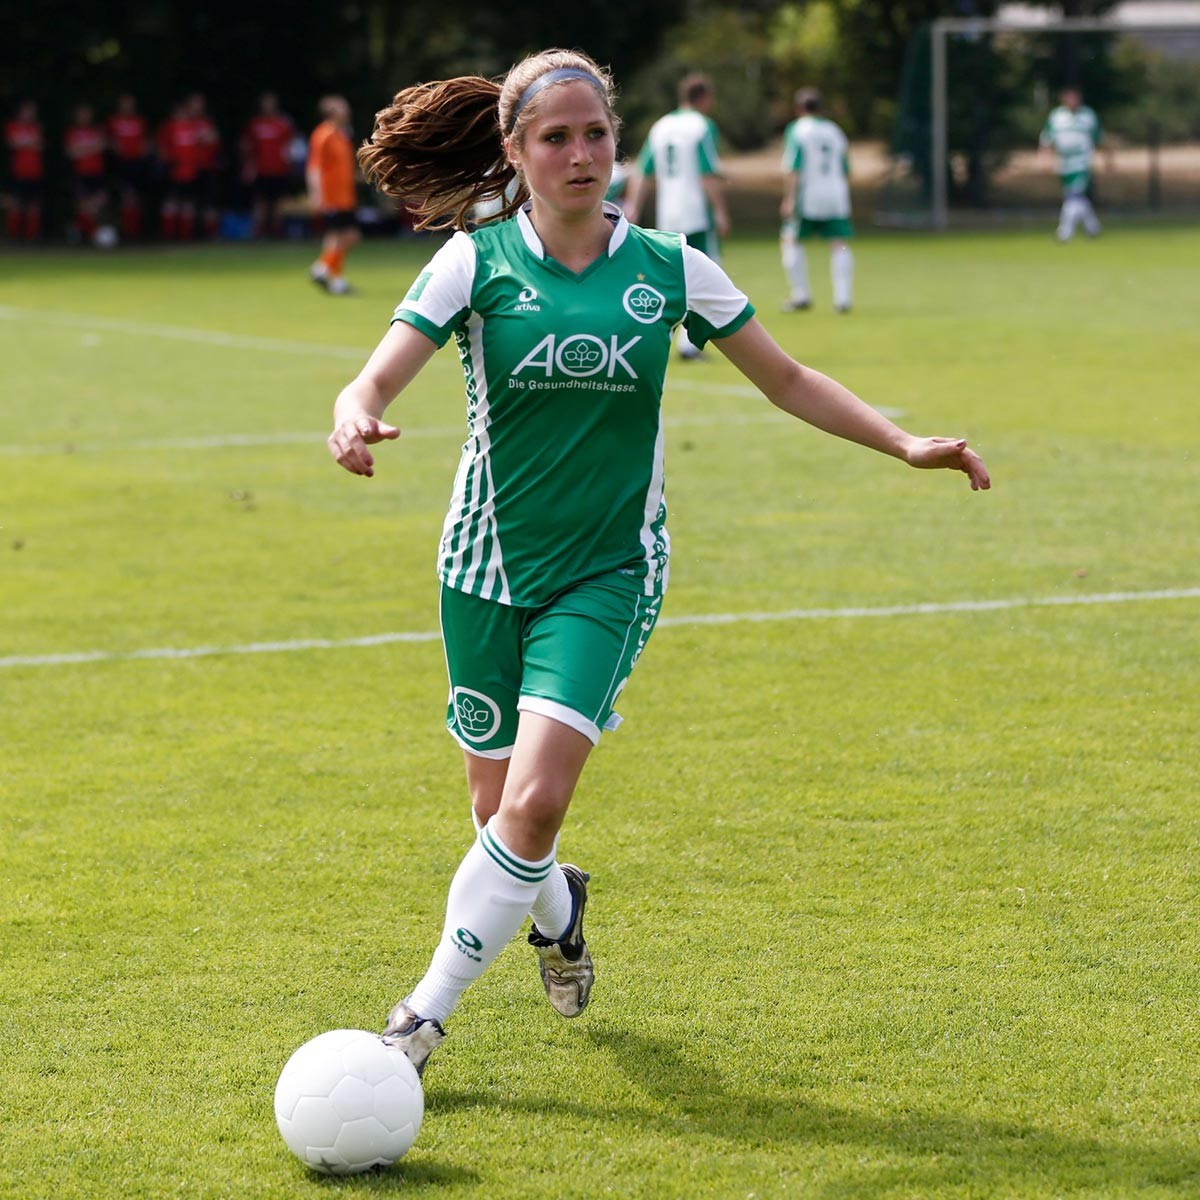 uk availability af6b8 40928 Damen Fußball Trikot selbst gestalten